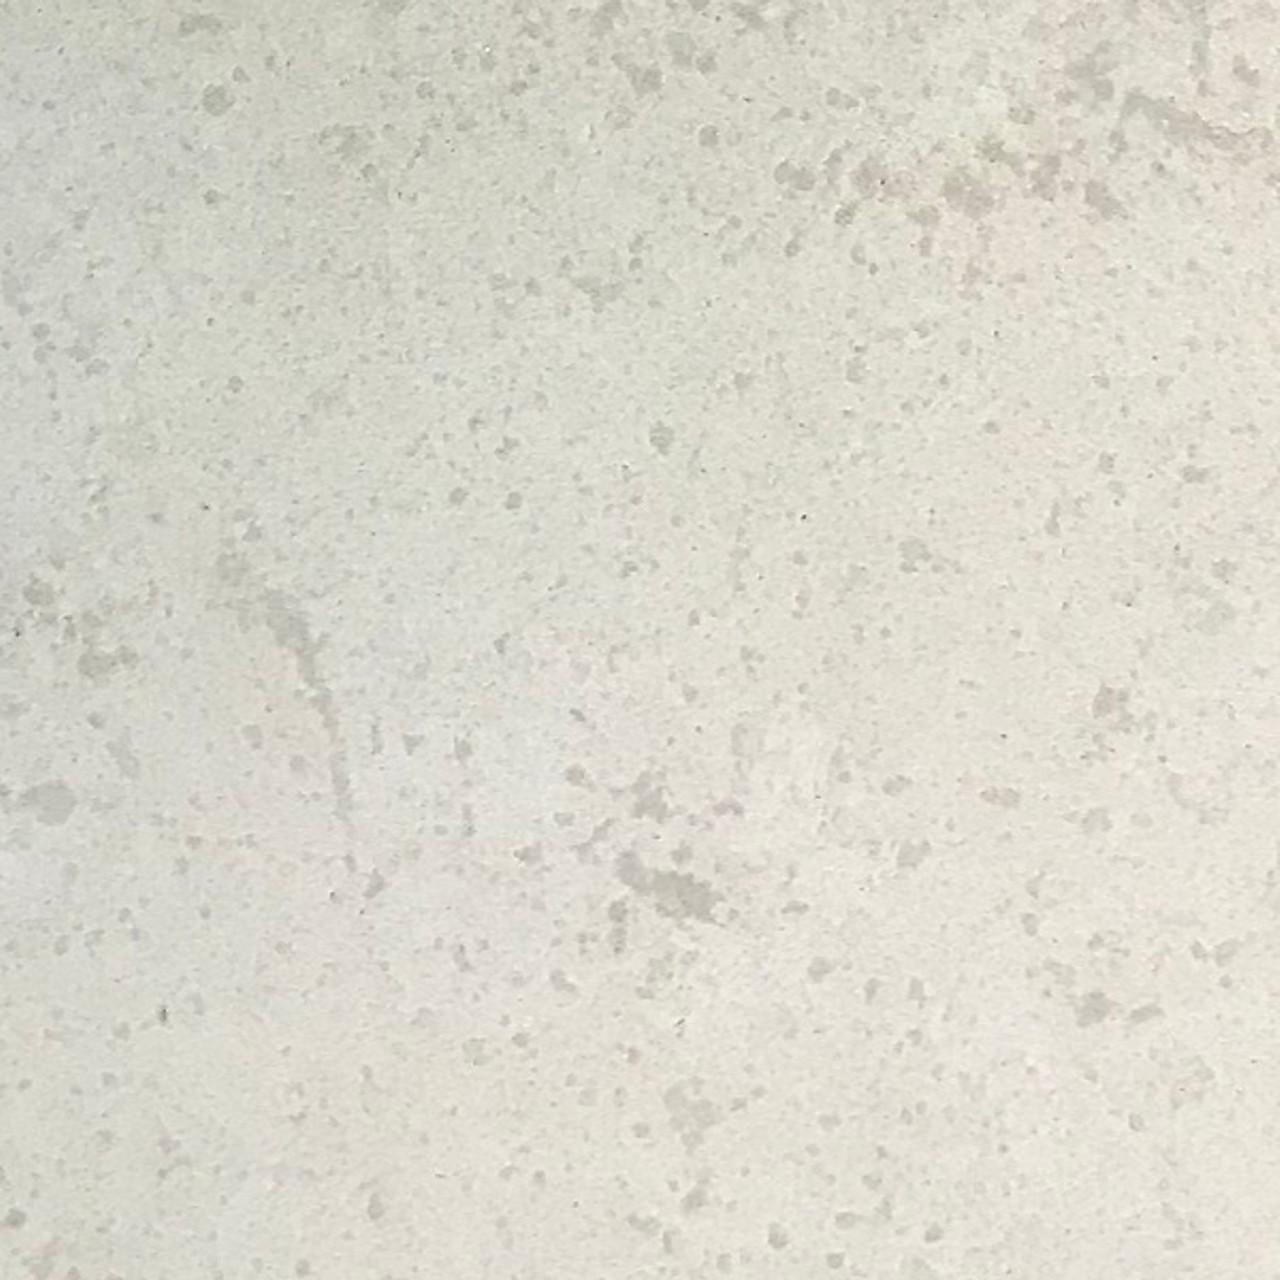 Bulgaria Cream Limestone Honed Finish